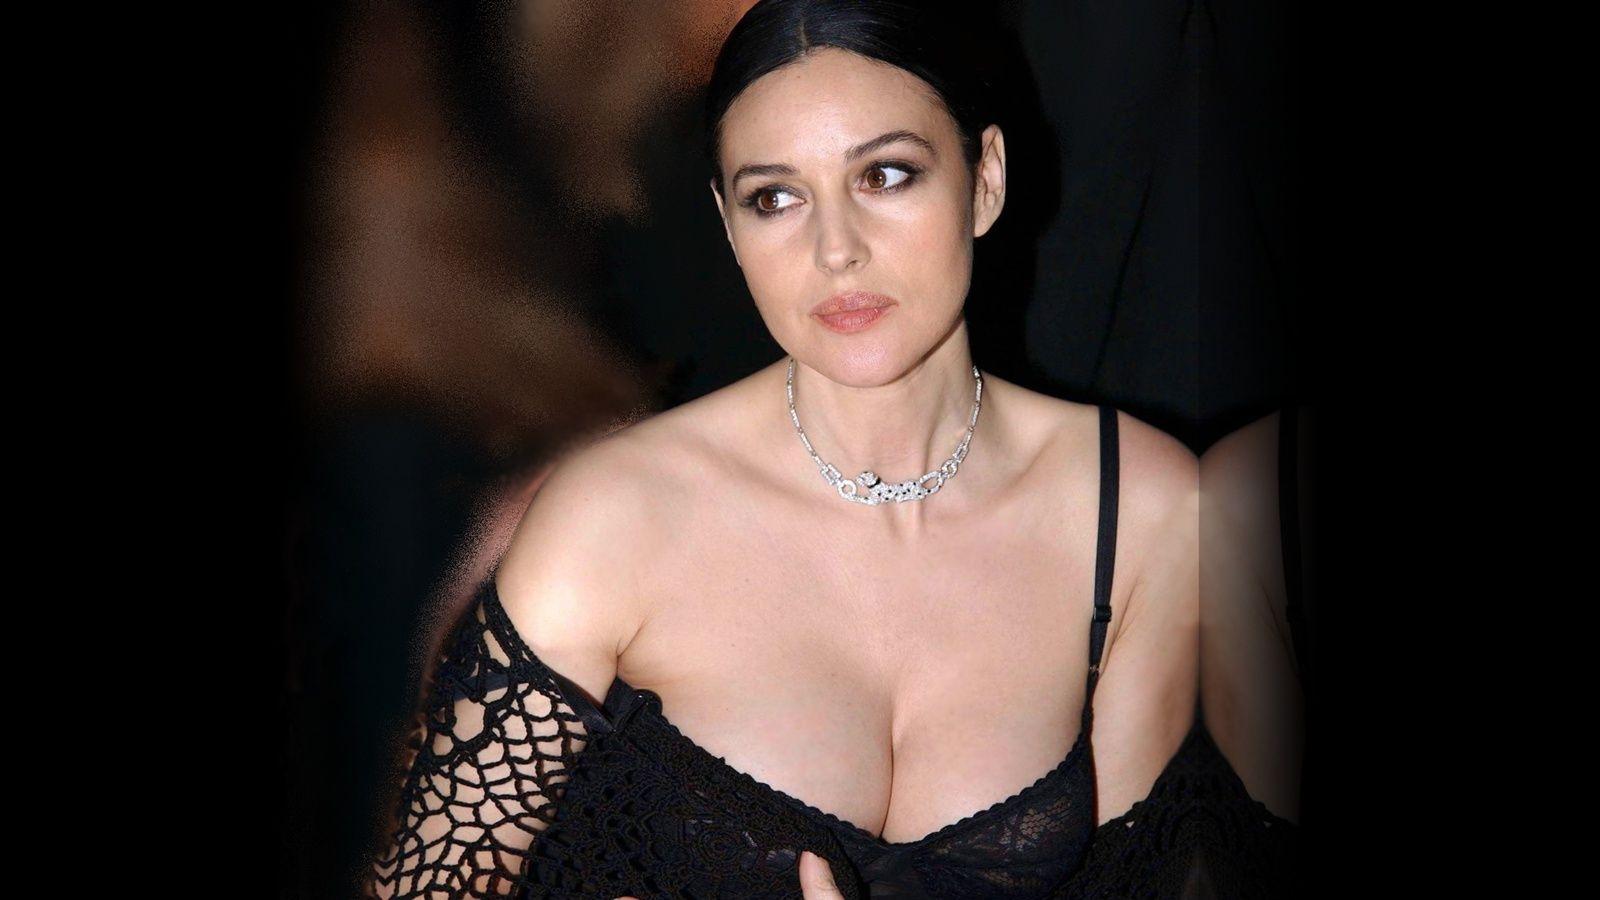 Hot Monica Bellucci Very Romantic Pics Follow Beautiful Girls Www Millionairematch Com